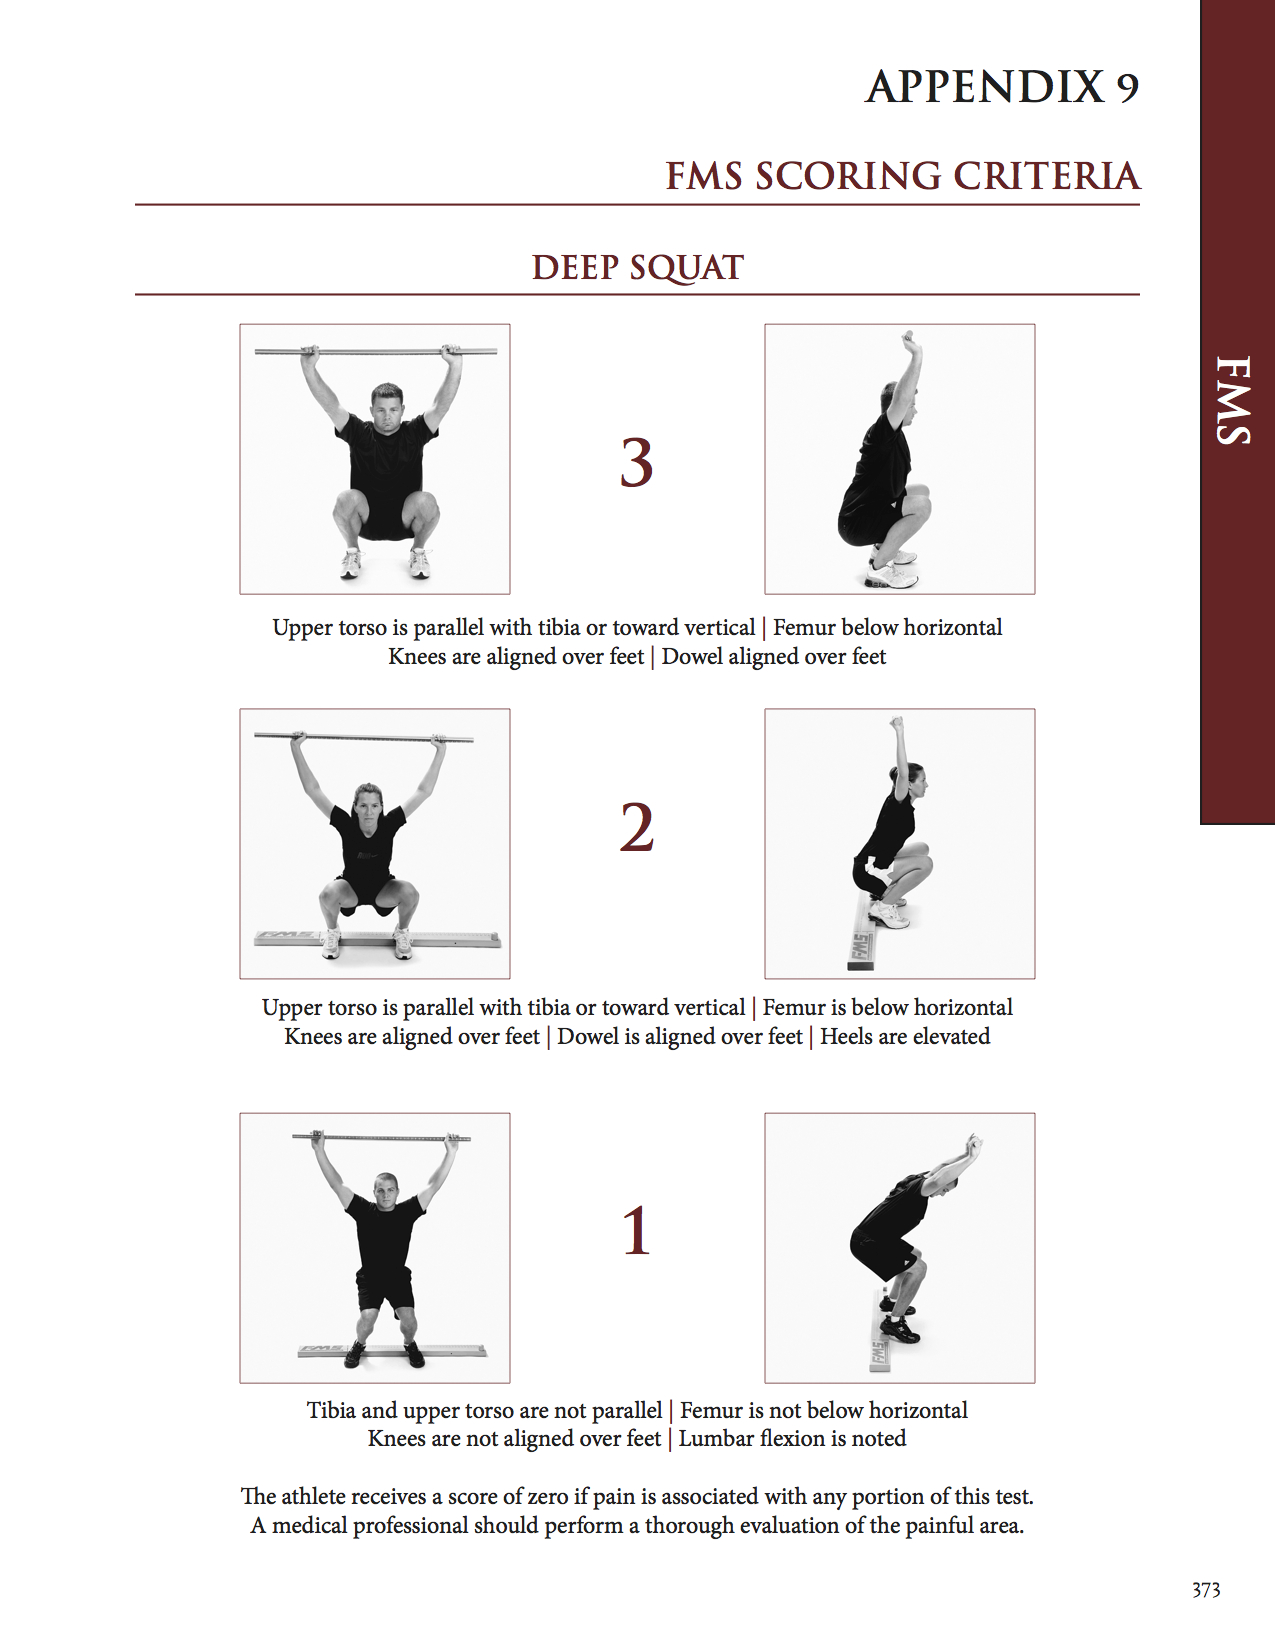 FMS Scoring Criteria, Score Sheet & Verbal Instructions.jpg